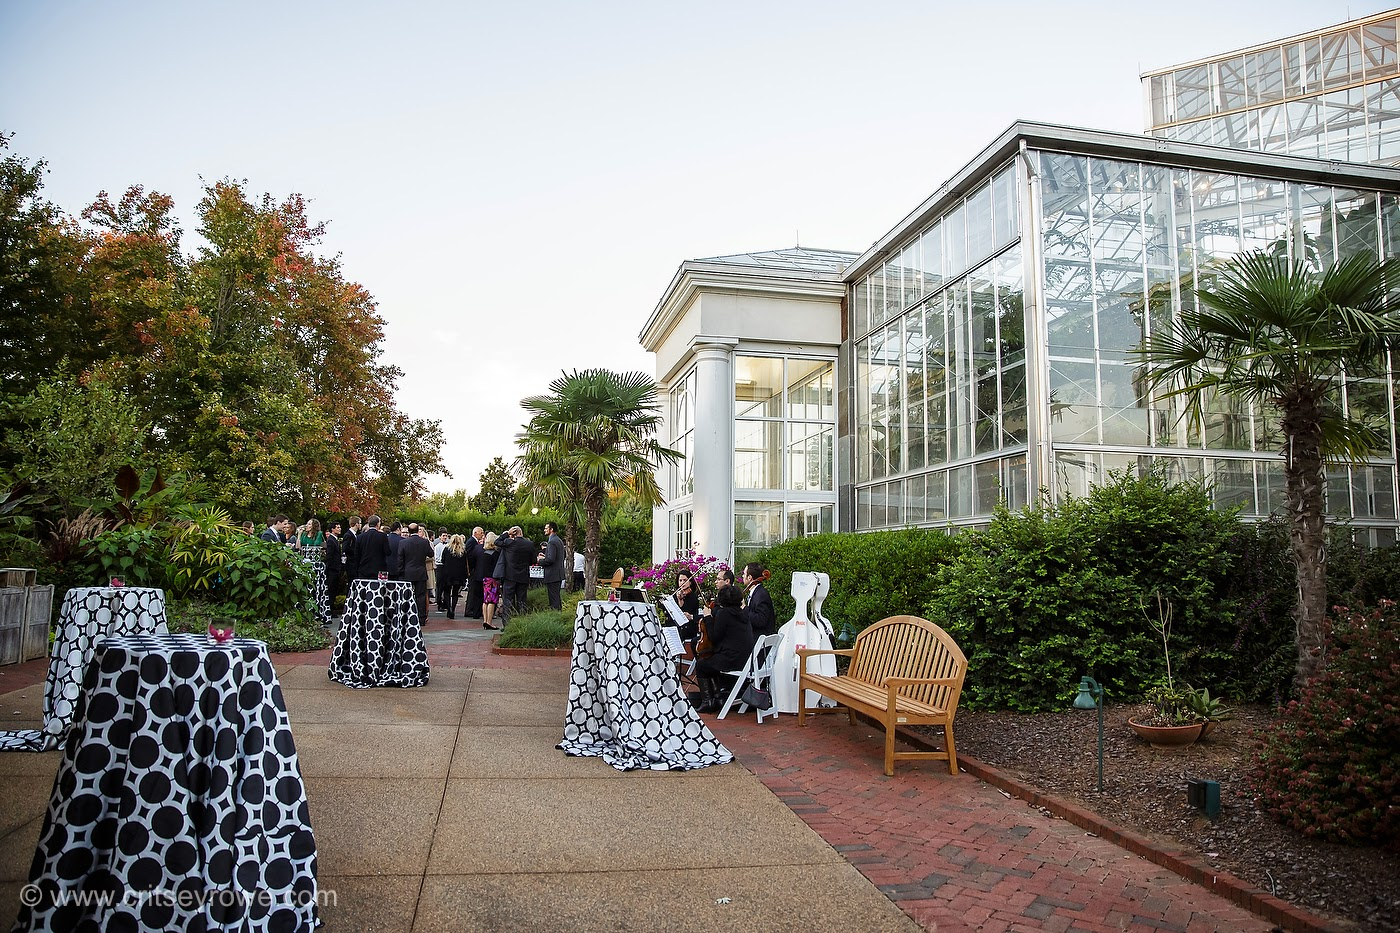 Daniel stowe botanical garden belmont nc wedding venue Daniel stowe botanical garden belmont nc